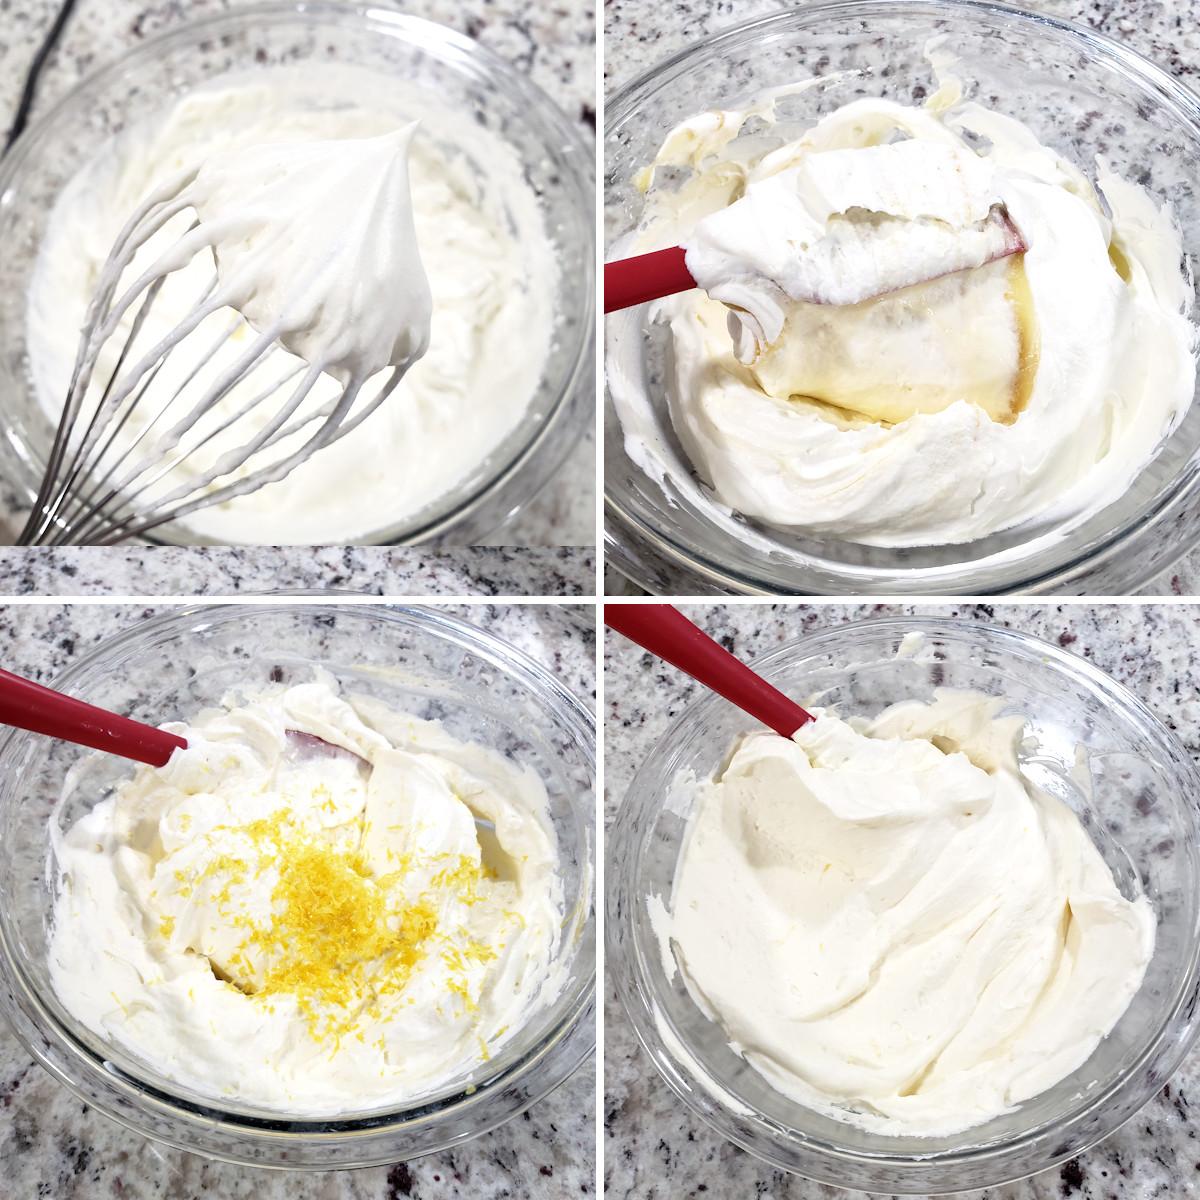 Preparing lemon mousse in a glass bowl.